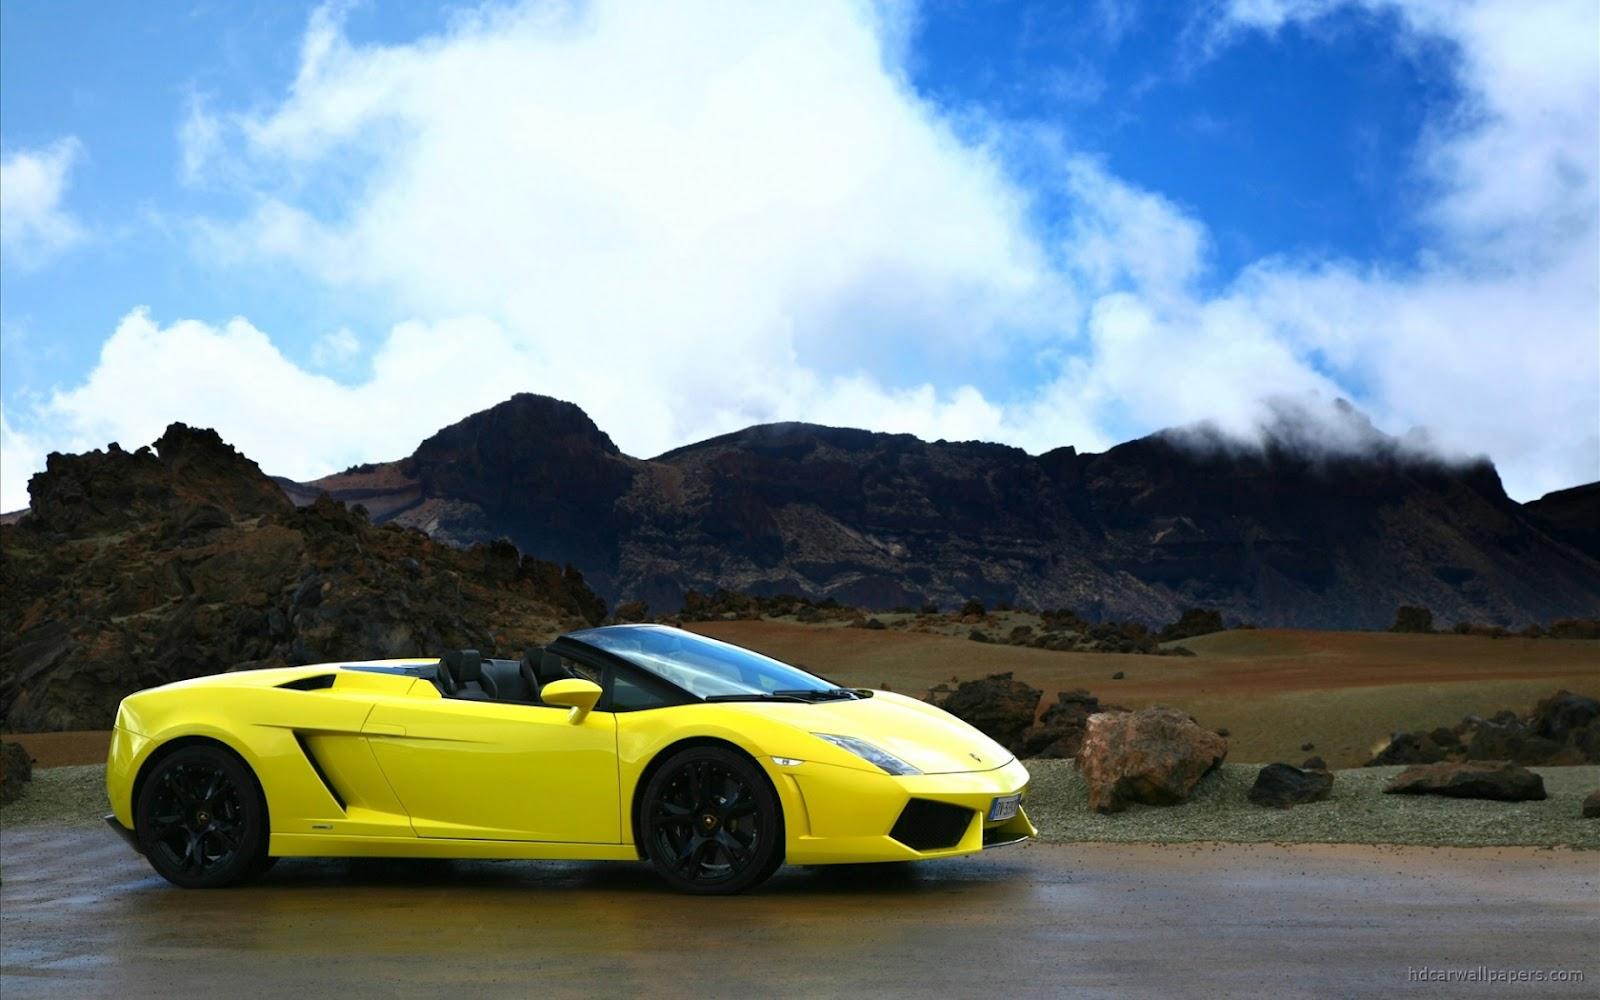 Lamborghini & Widescreen Lamborghini Wallpapers from the above ...